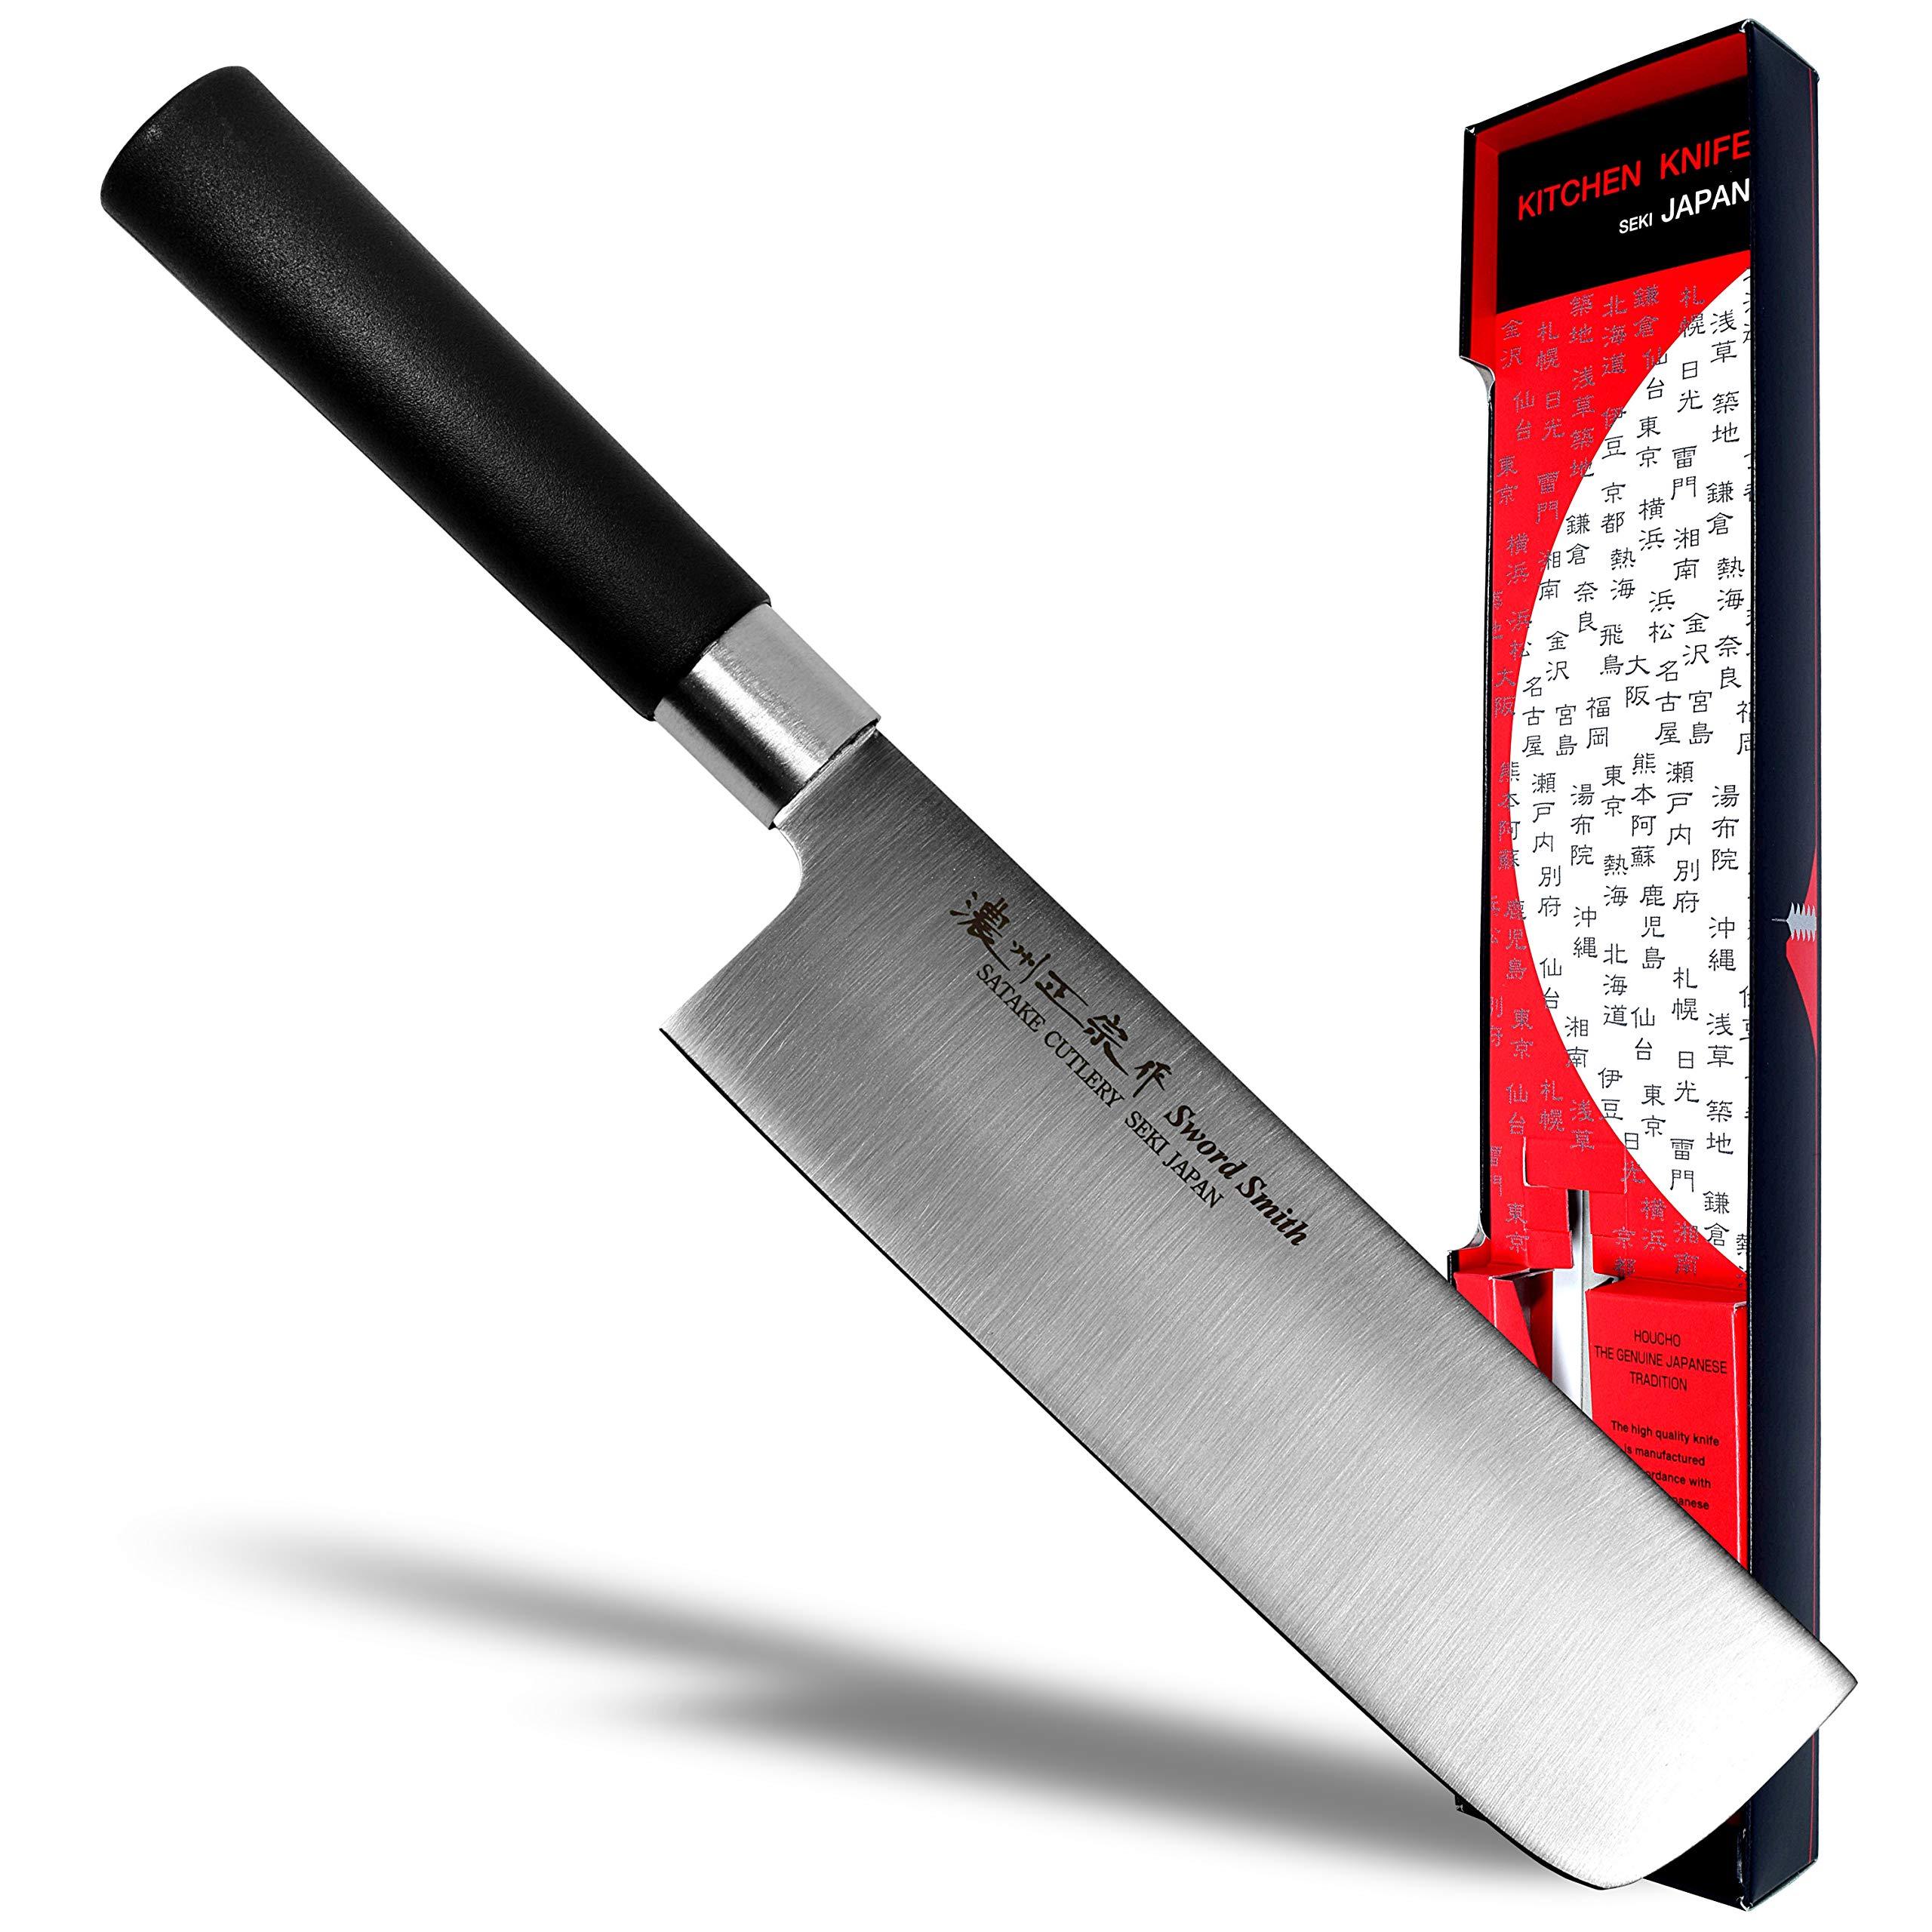 Seki Japan MASAMUNE, Japanese Vegetable Kitchen Knife, Stainless Steel Wa Nakiri Knife, PP Handle, 6.7 inch (170mm)